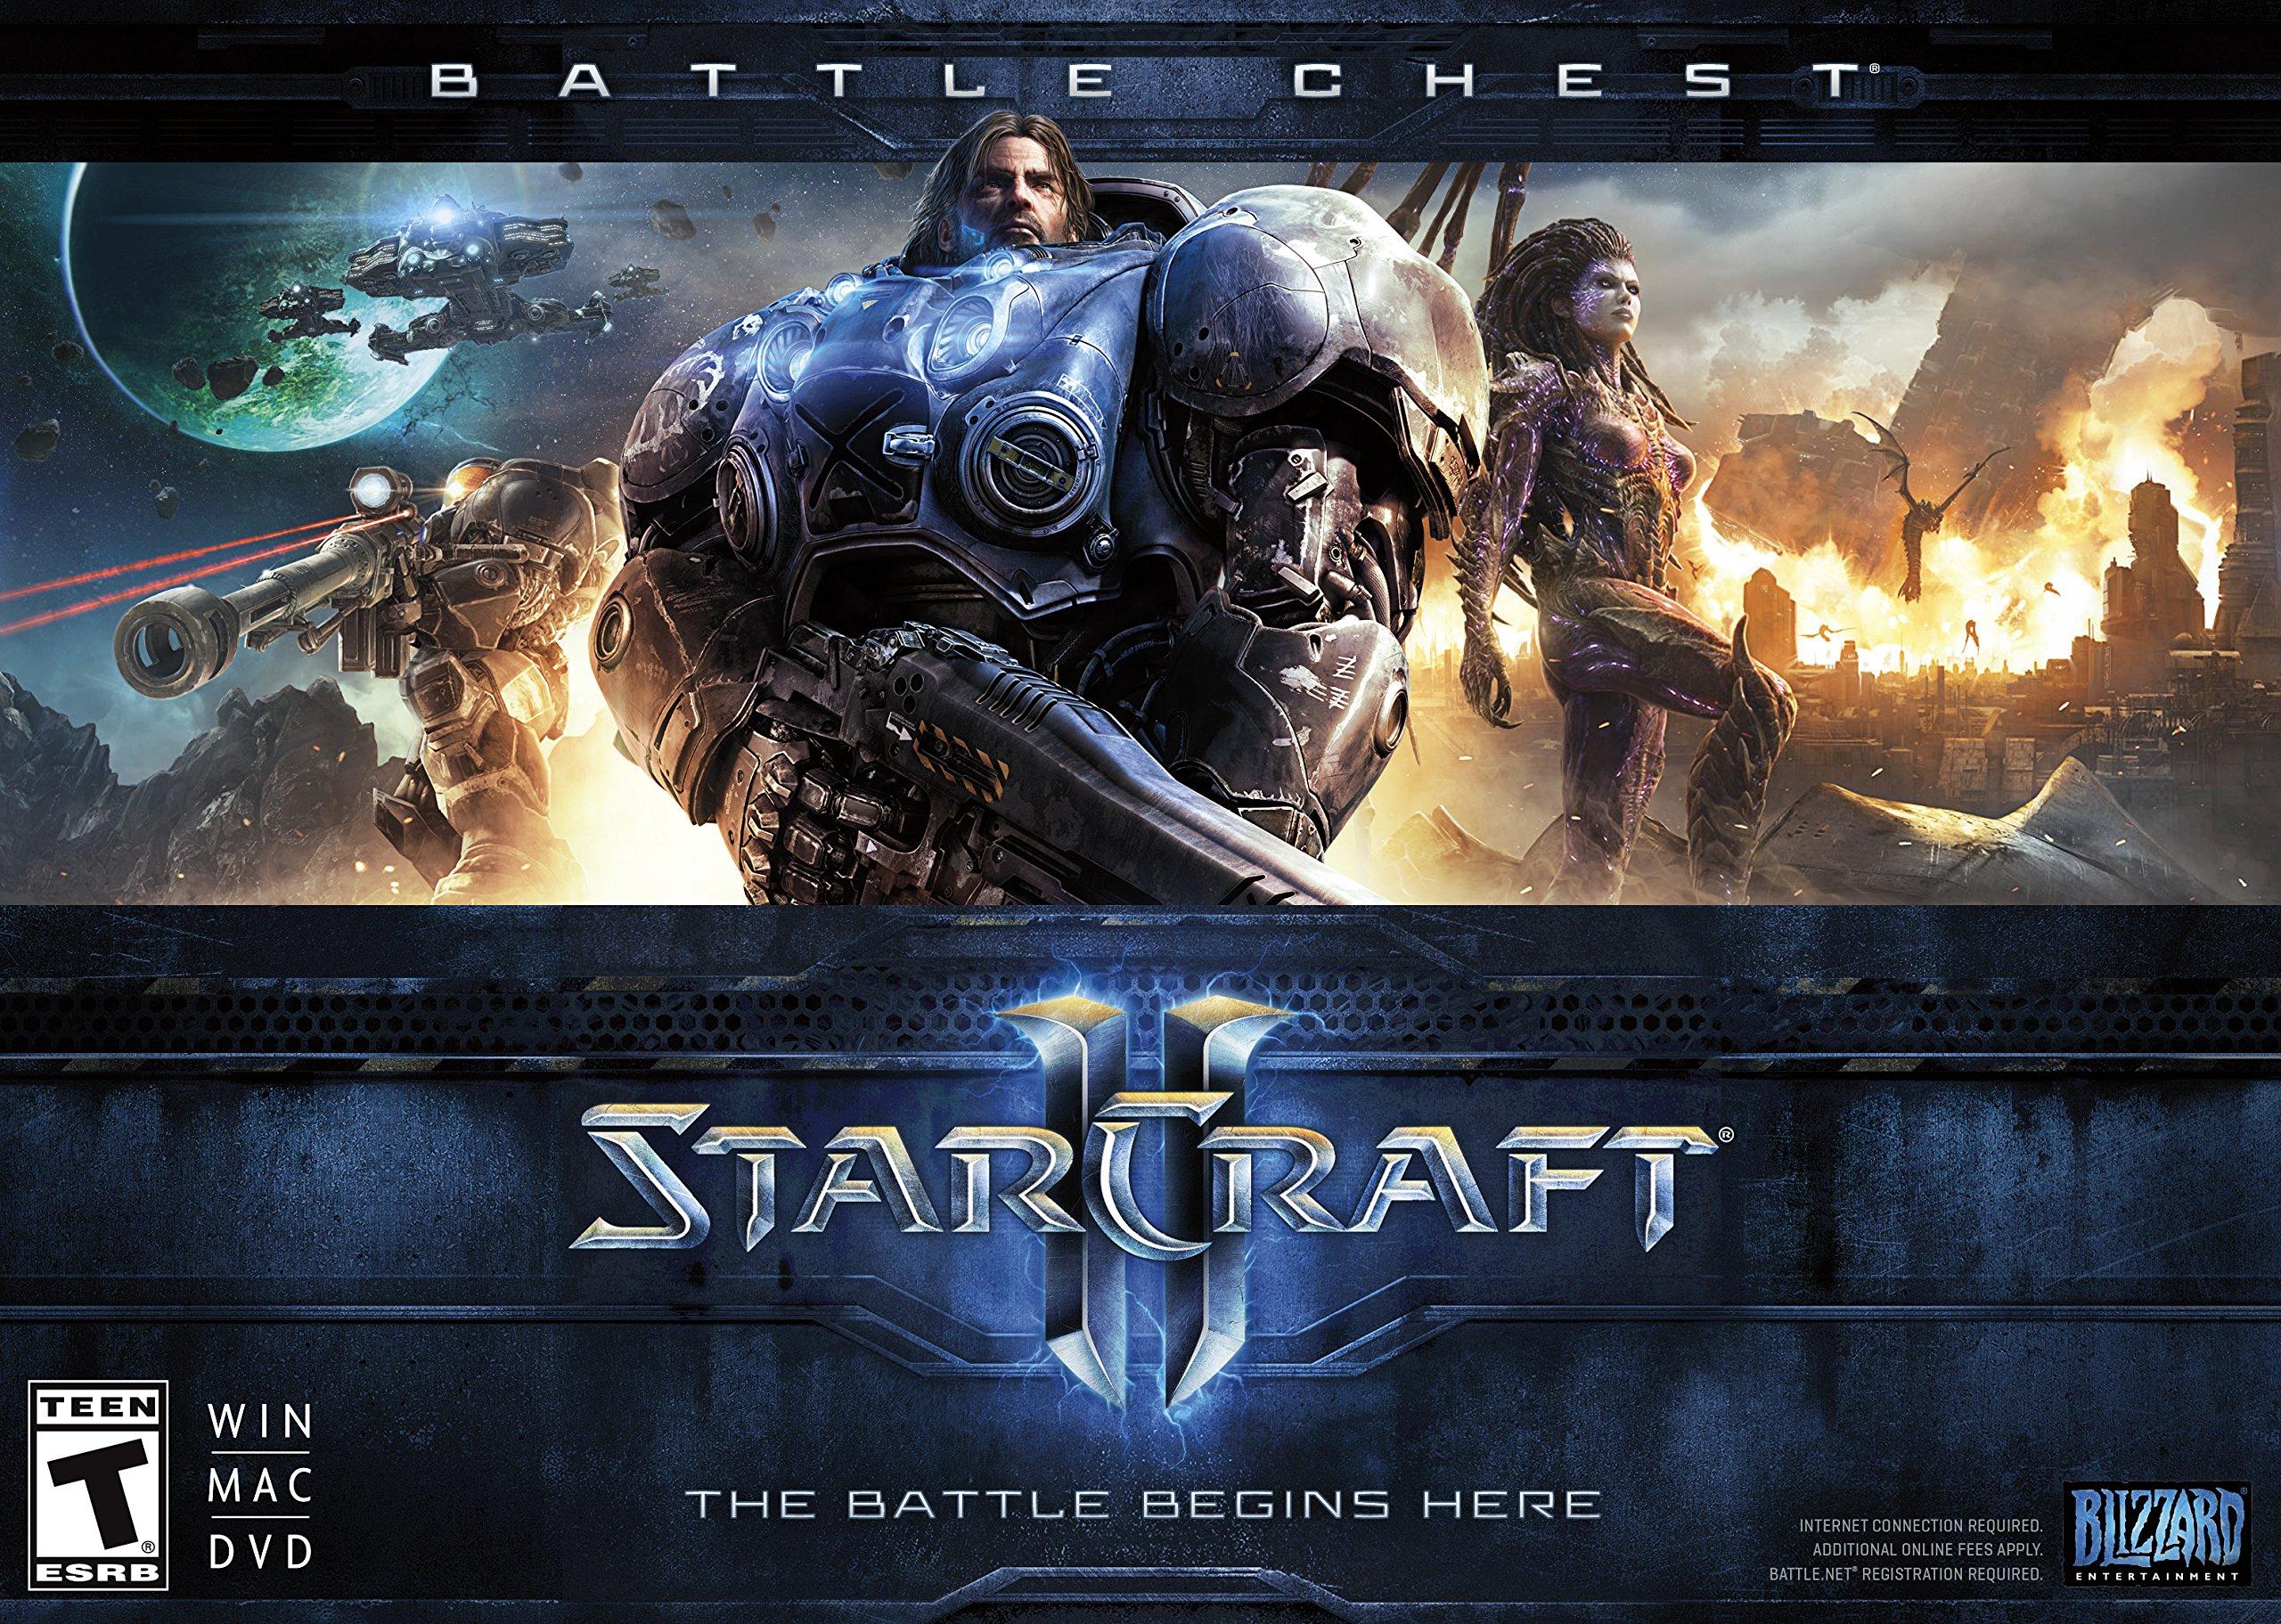 Starcraft II: Battle Chest - PC/Mac by Blizzard Entertainment (Image #4)